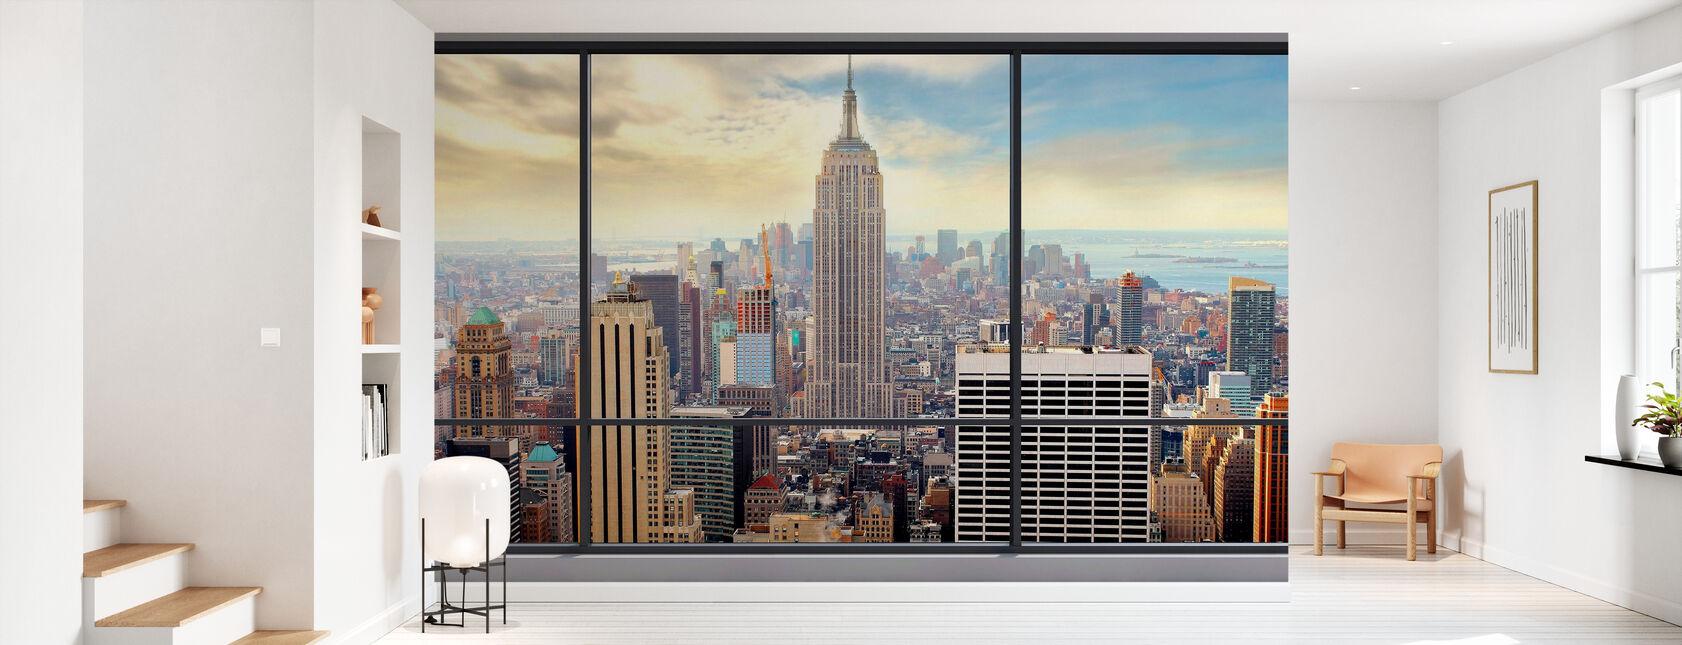 Penthouse Window View - Wallpaper - Hallway